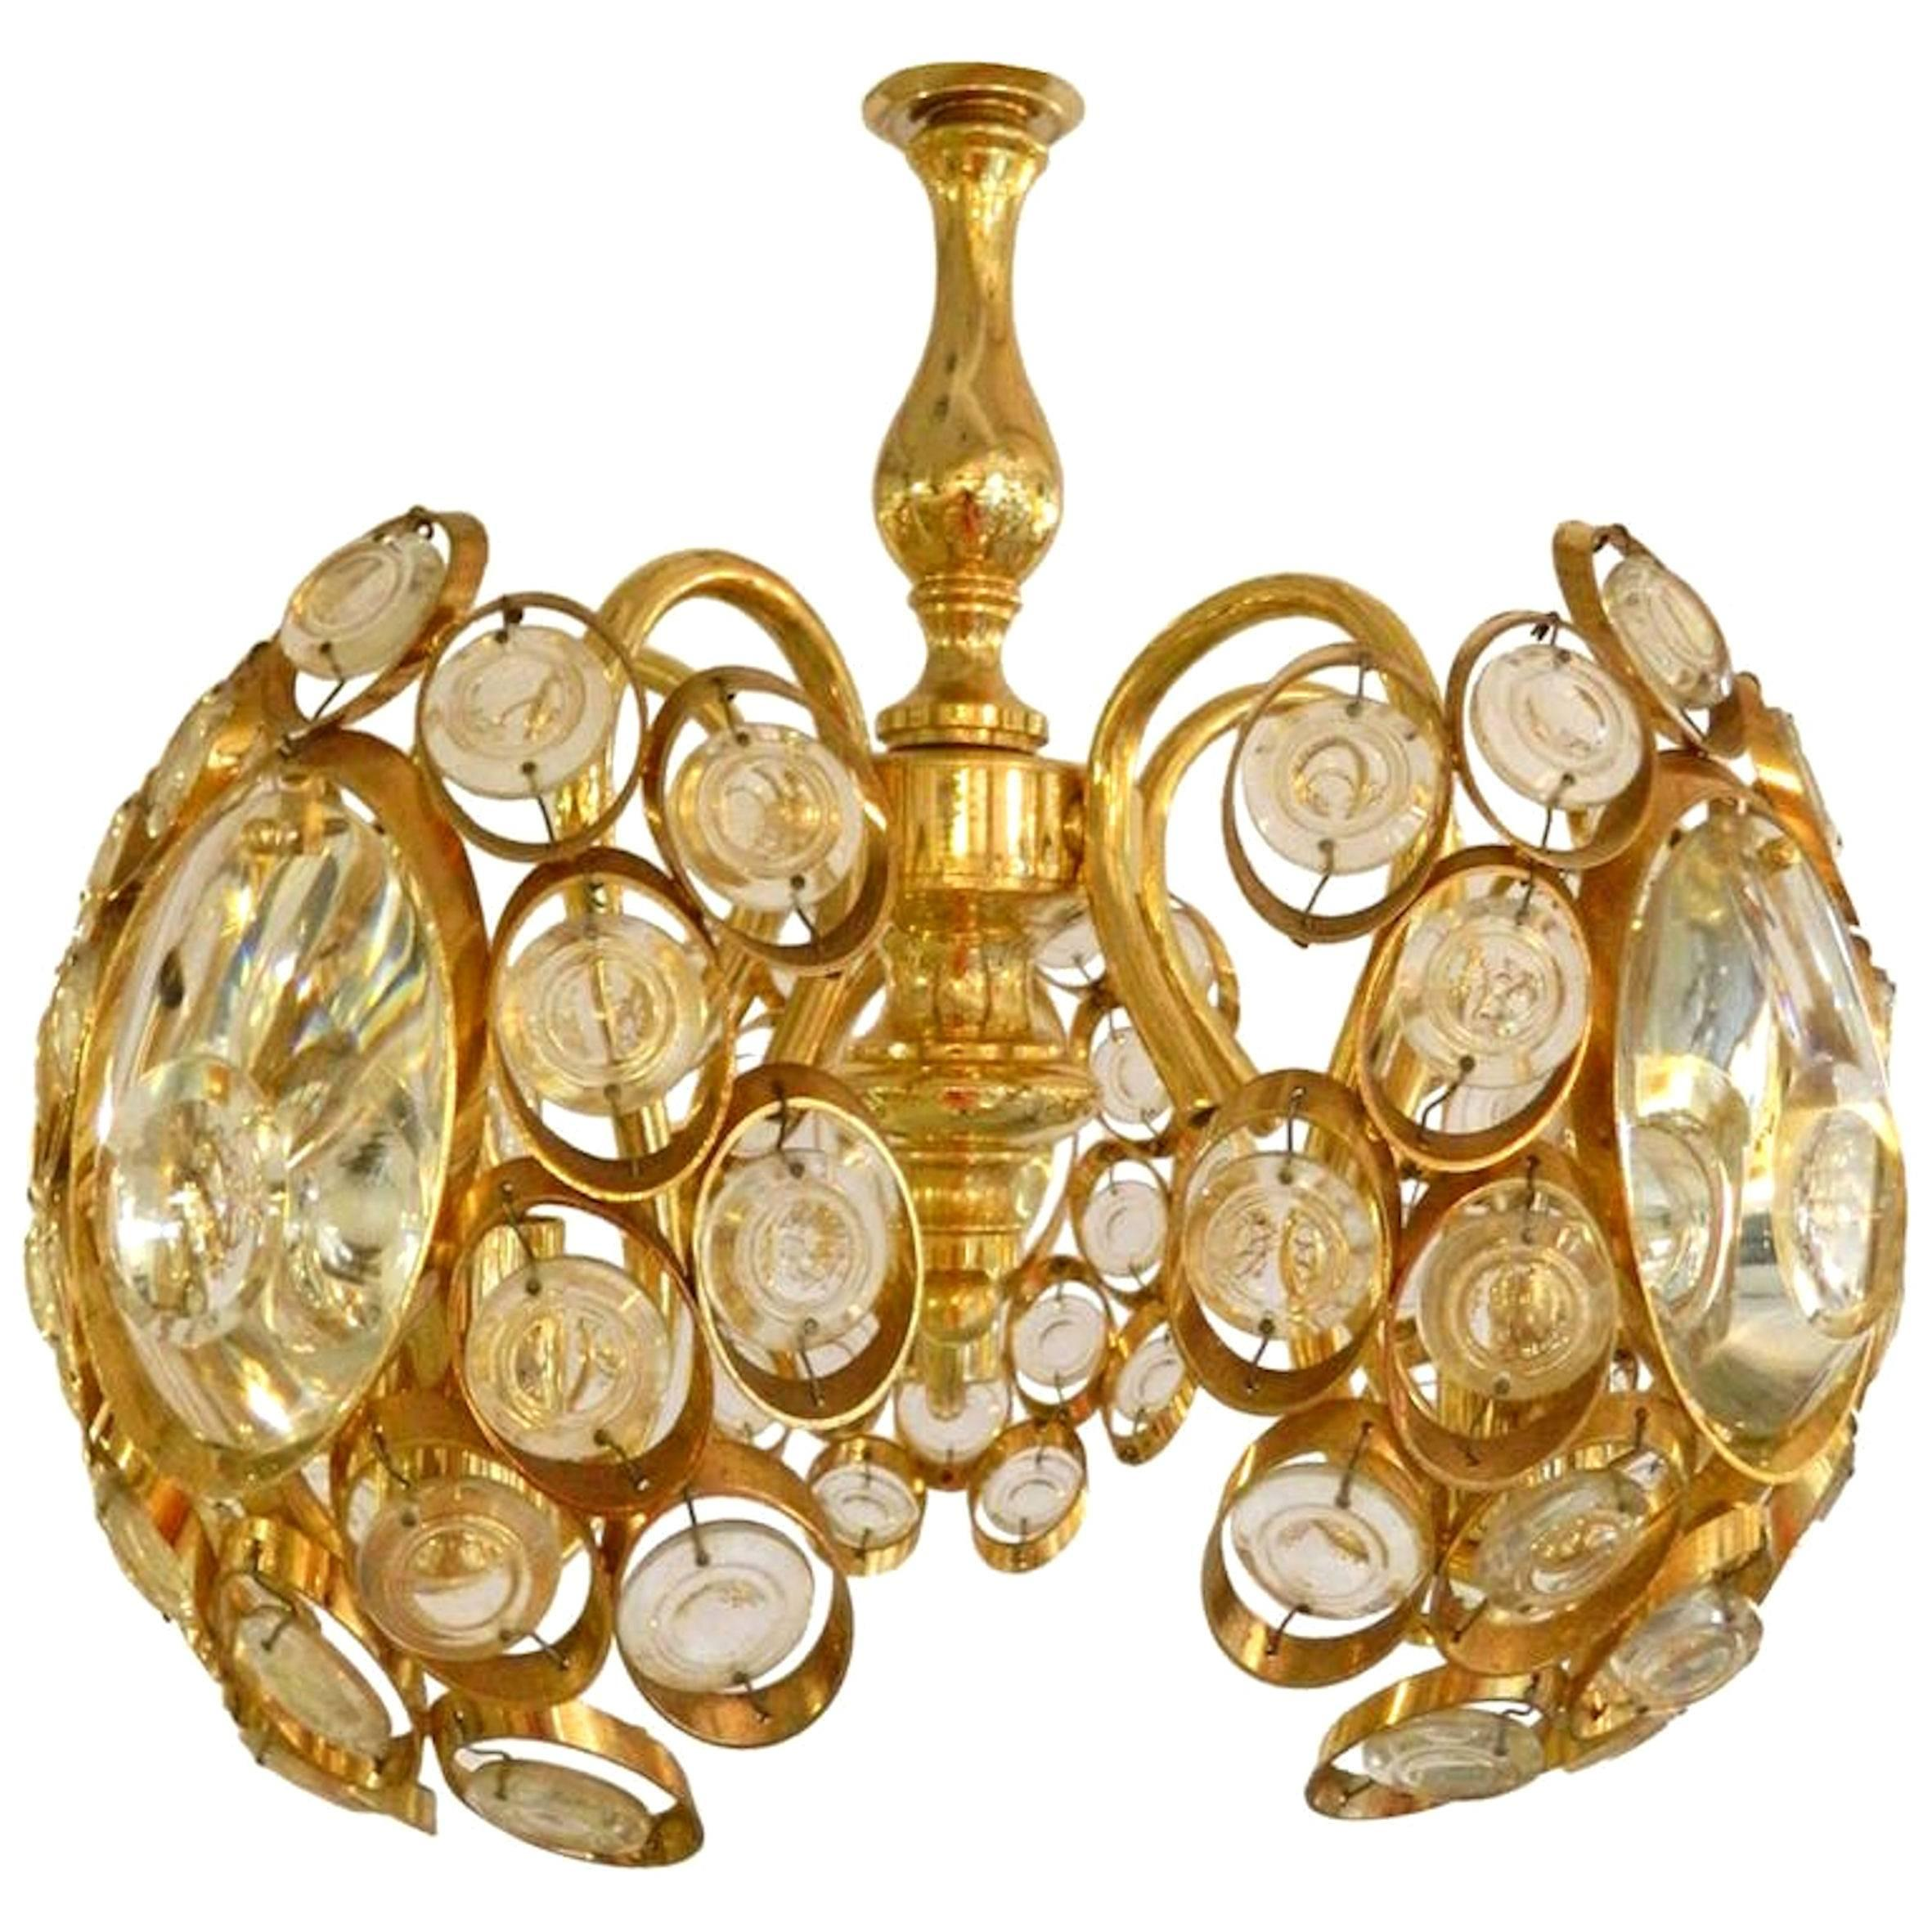 Mid century modern austrian lobmeyr cut crystal and gold plated mid century modern austrian lobmeyr cut crystal and gold plated chandelier for sale at 1stdibs aloadofball Image collections